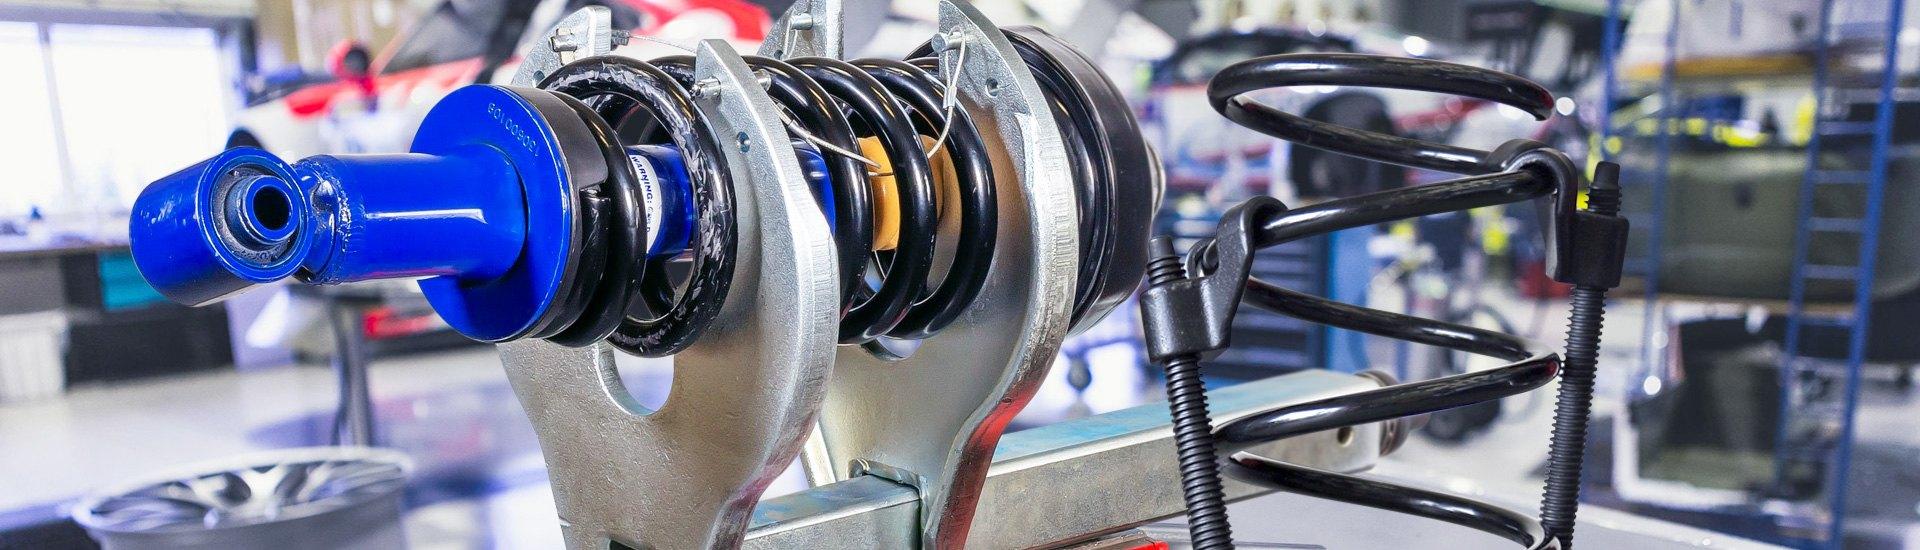 Suspension & Steering Service Tools